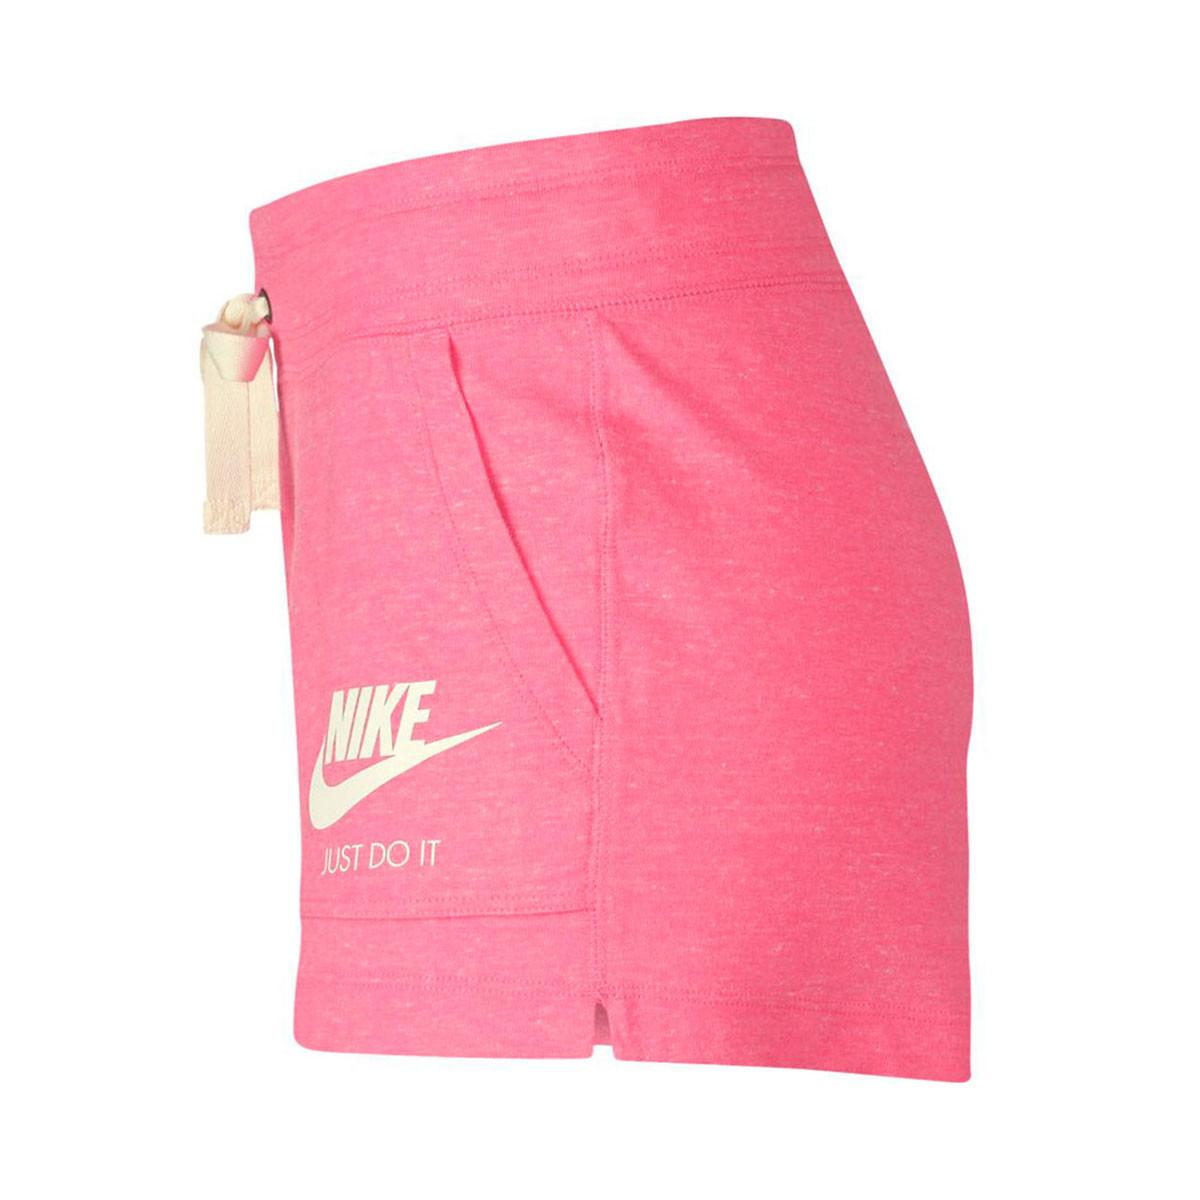 Calções Nike Sportswear Vintage Mulher